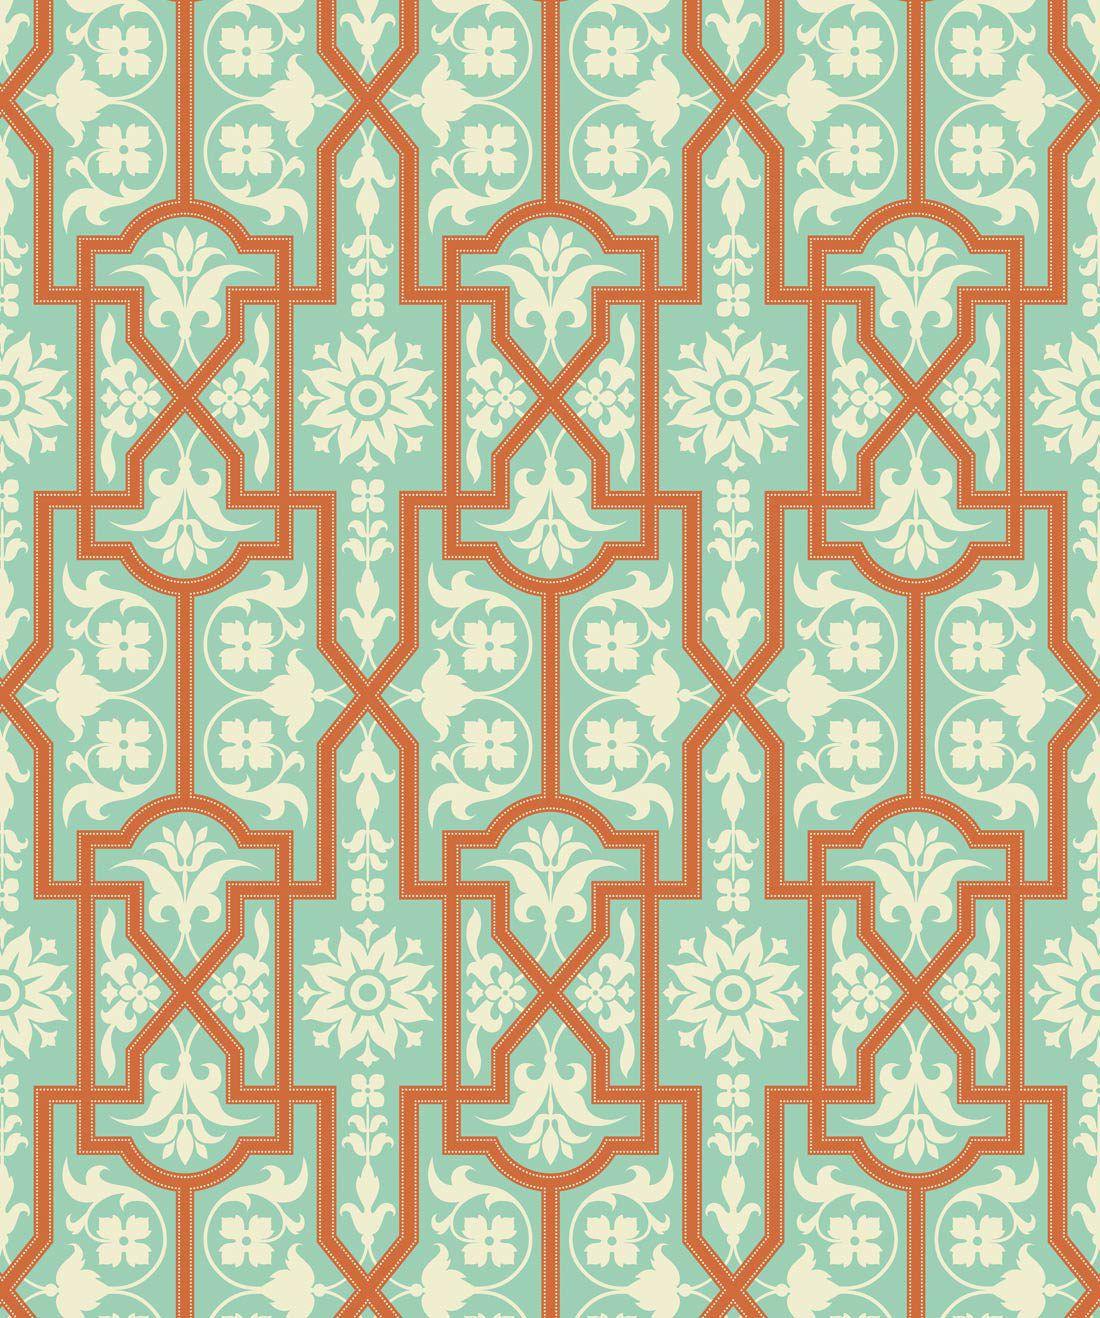 Architectural Apricot Wallpaper